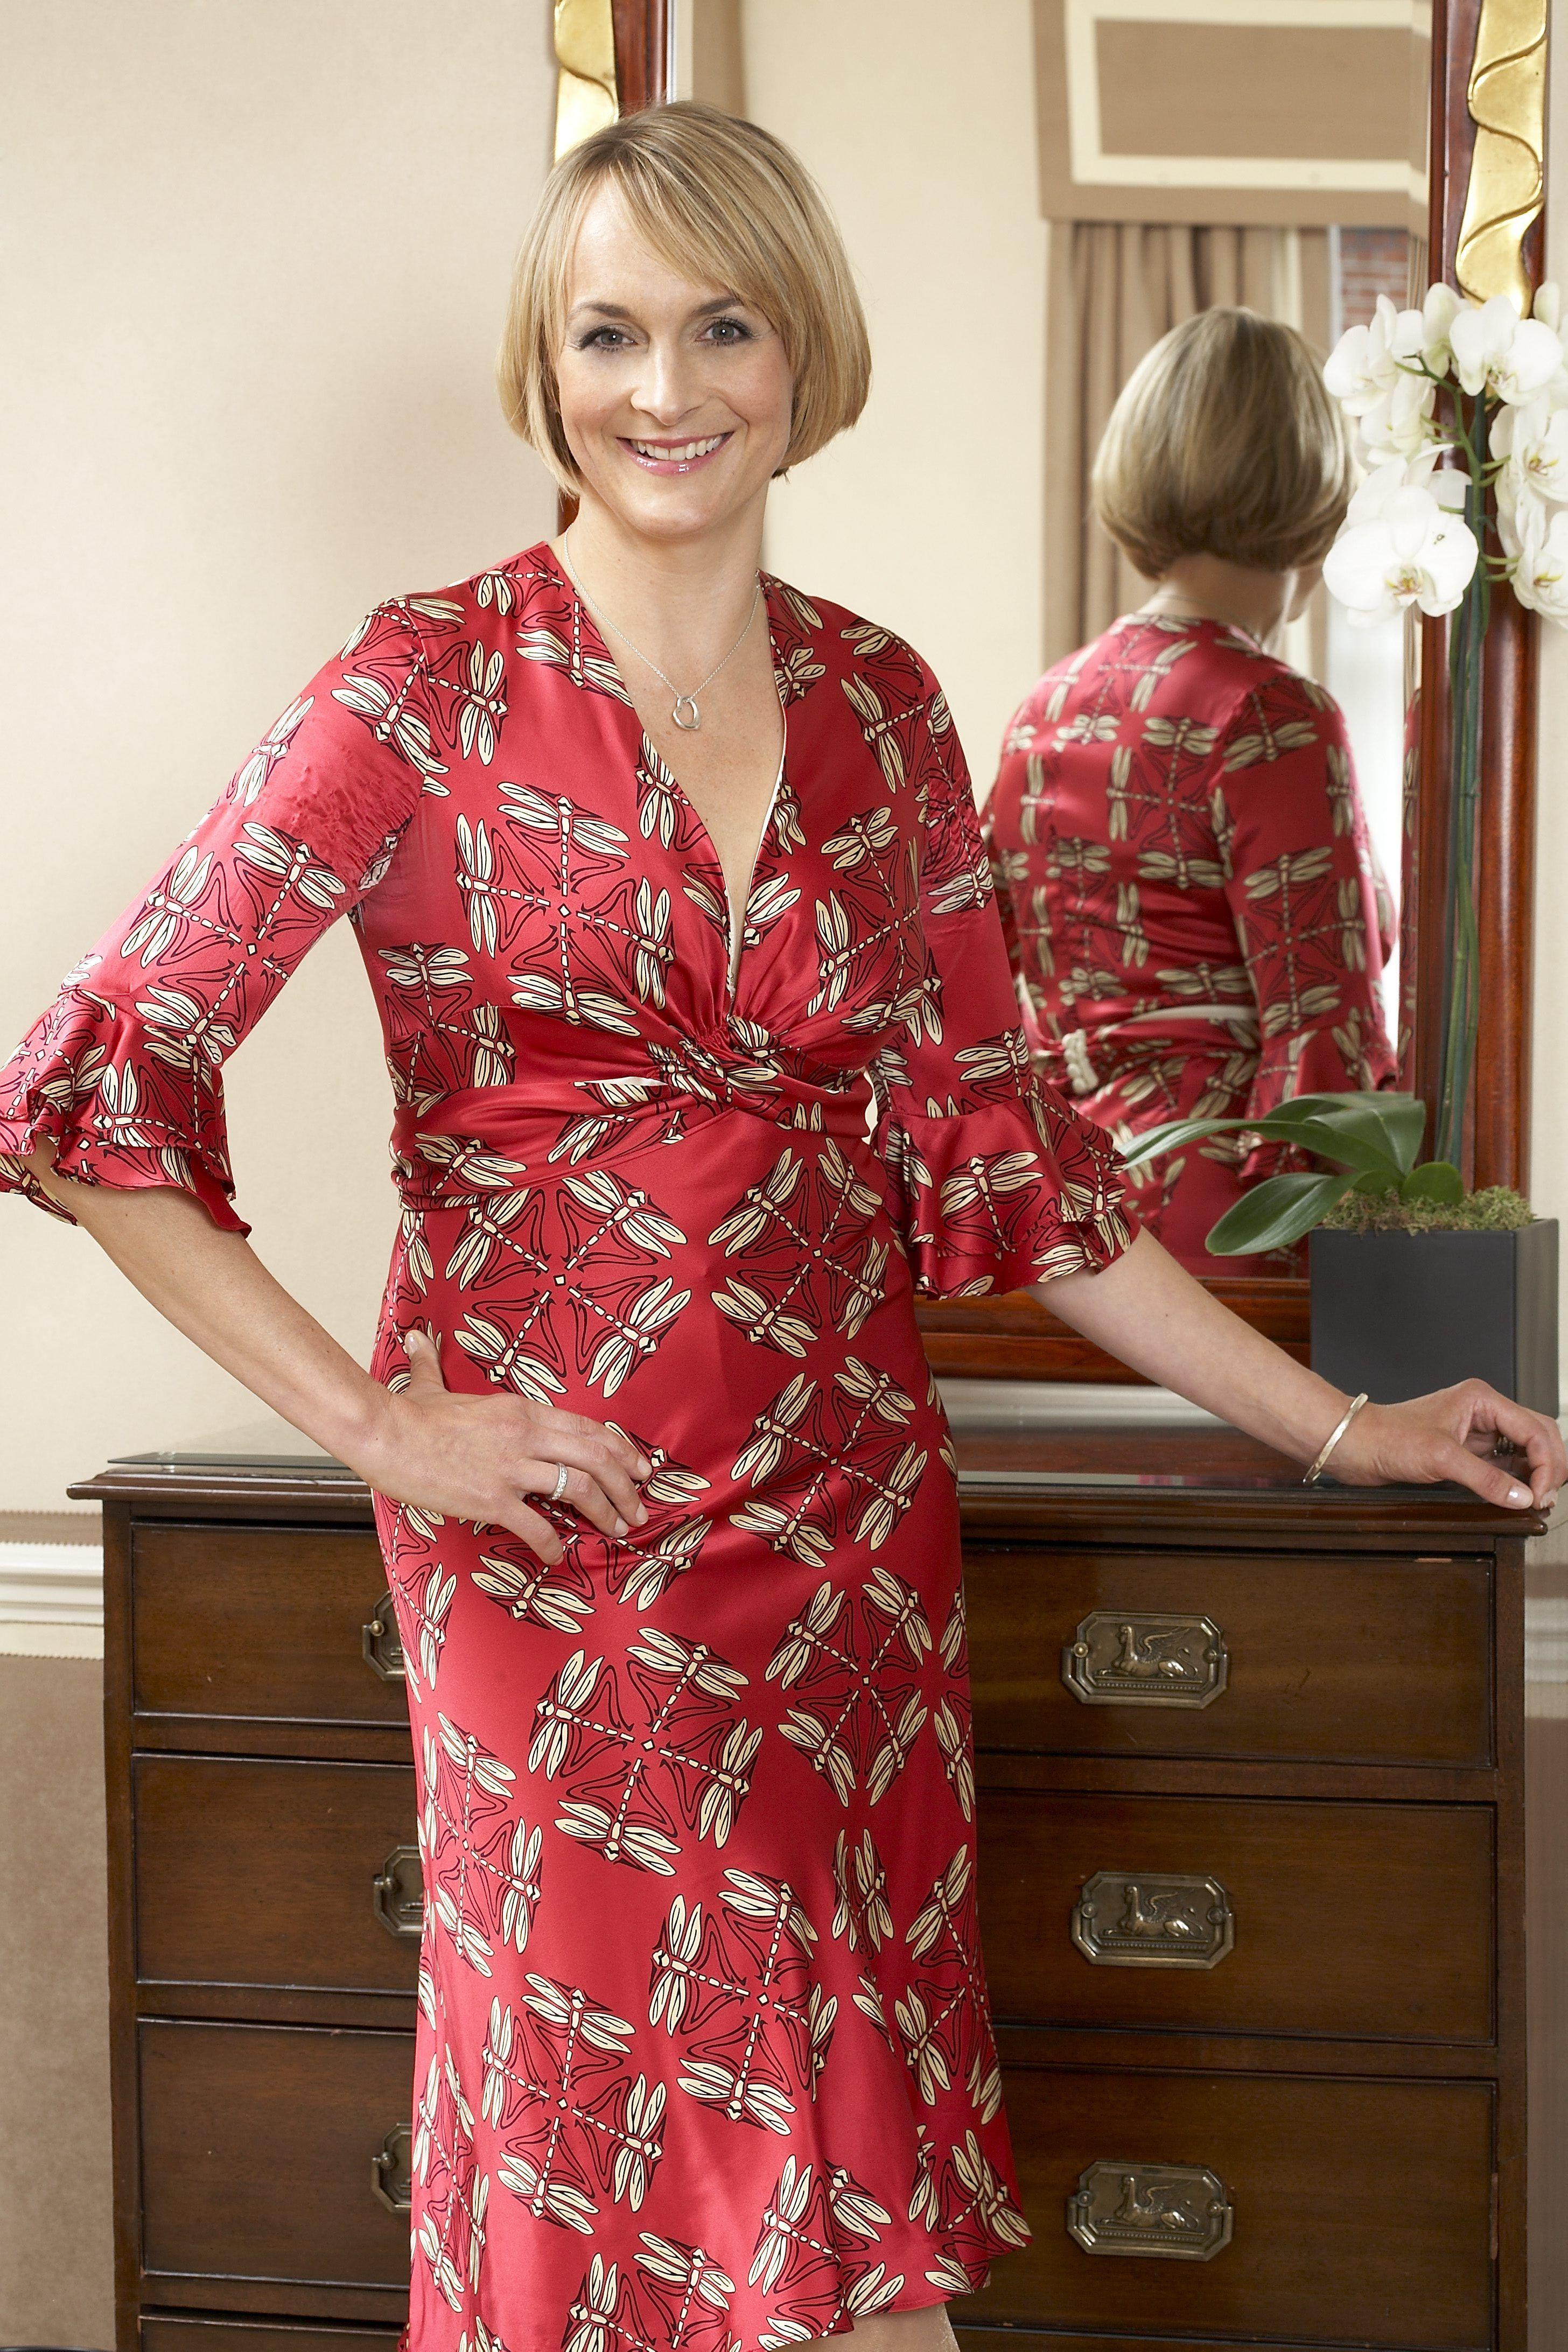 Louise Minchin Gorgeous Women, British Celebrities, Lady, Sexy Dresses,  Bbc, Weather